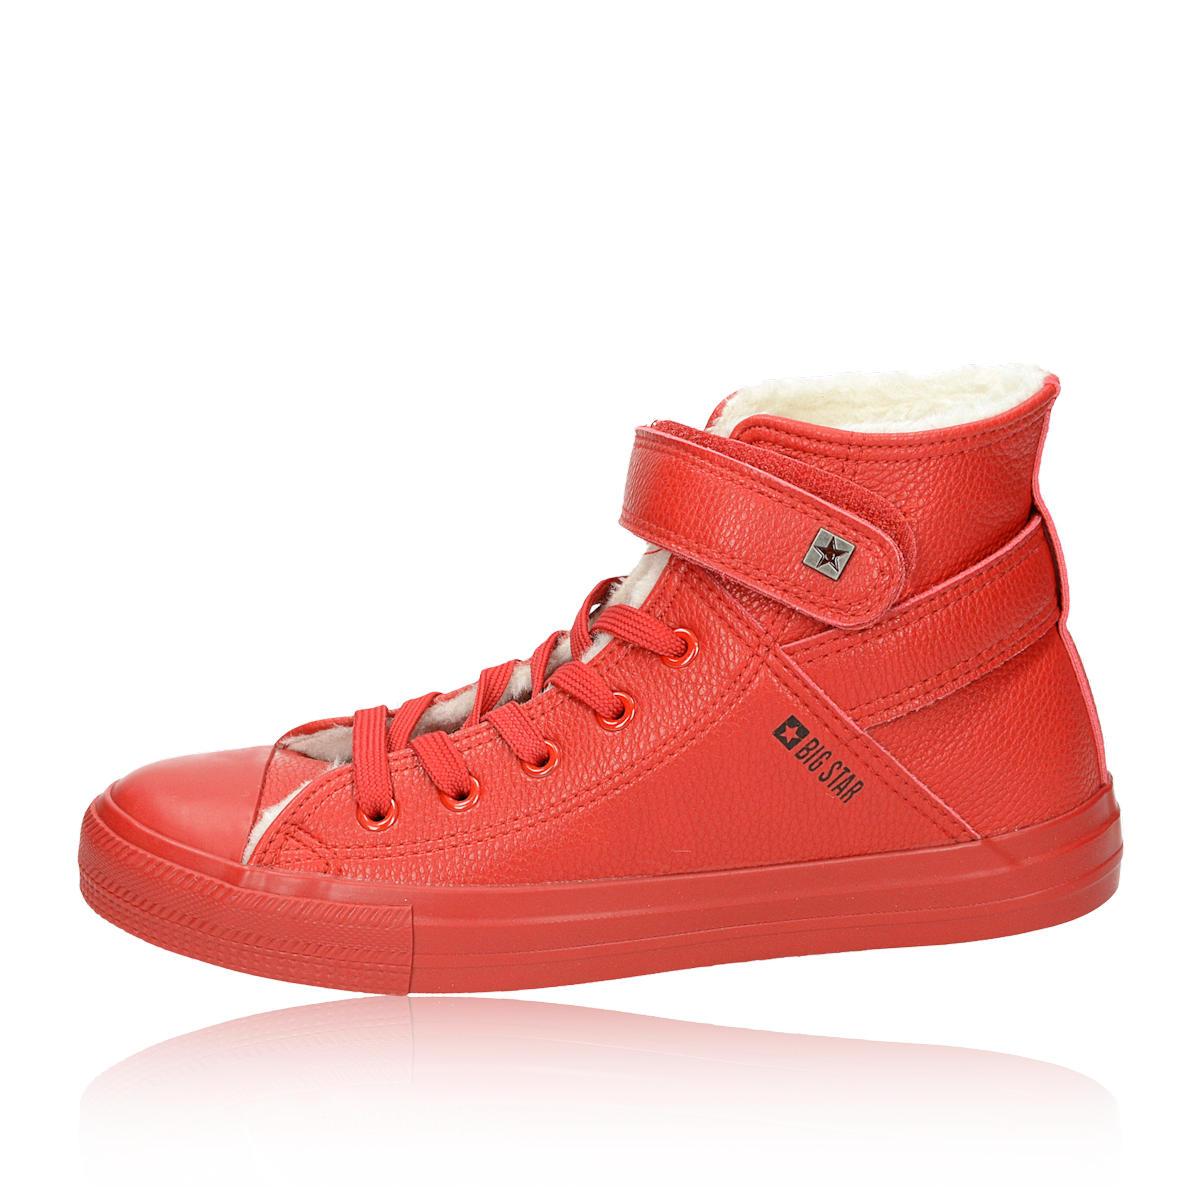 c18b2b2671 ... Big Star dámske štýlové tenisky - červené ...